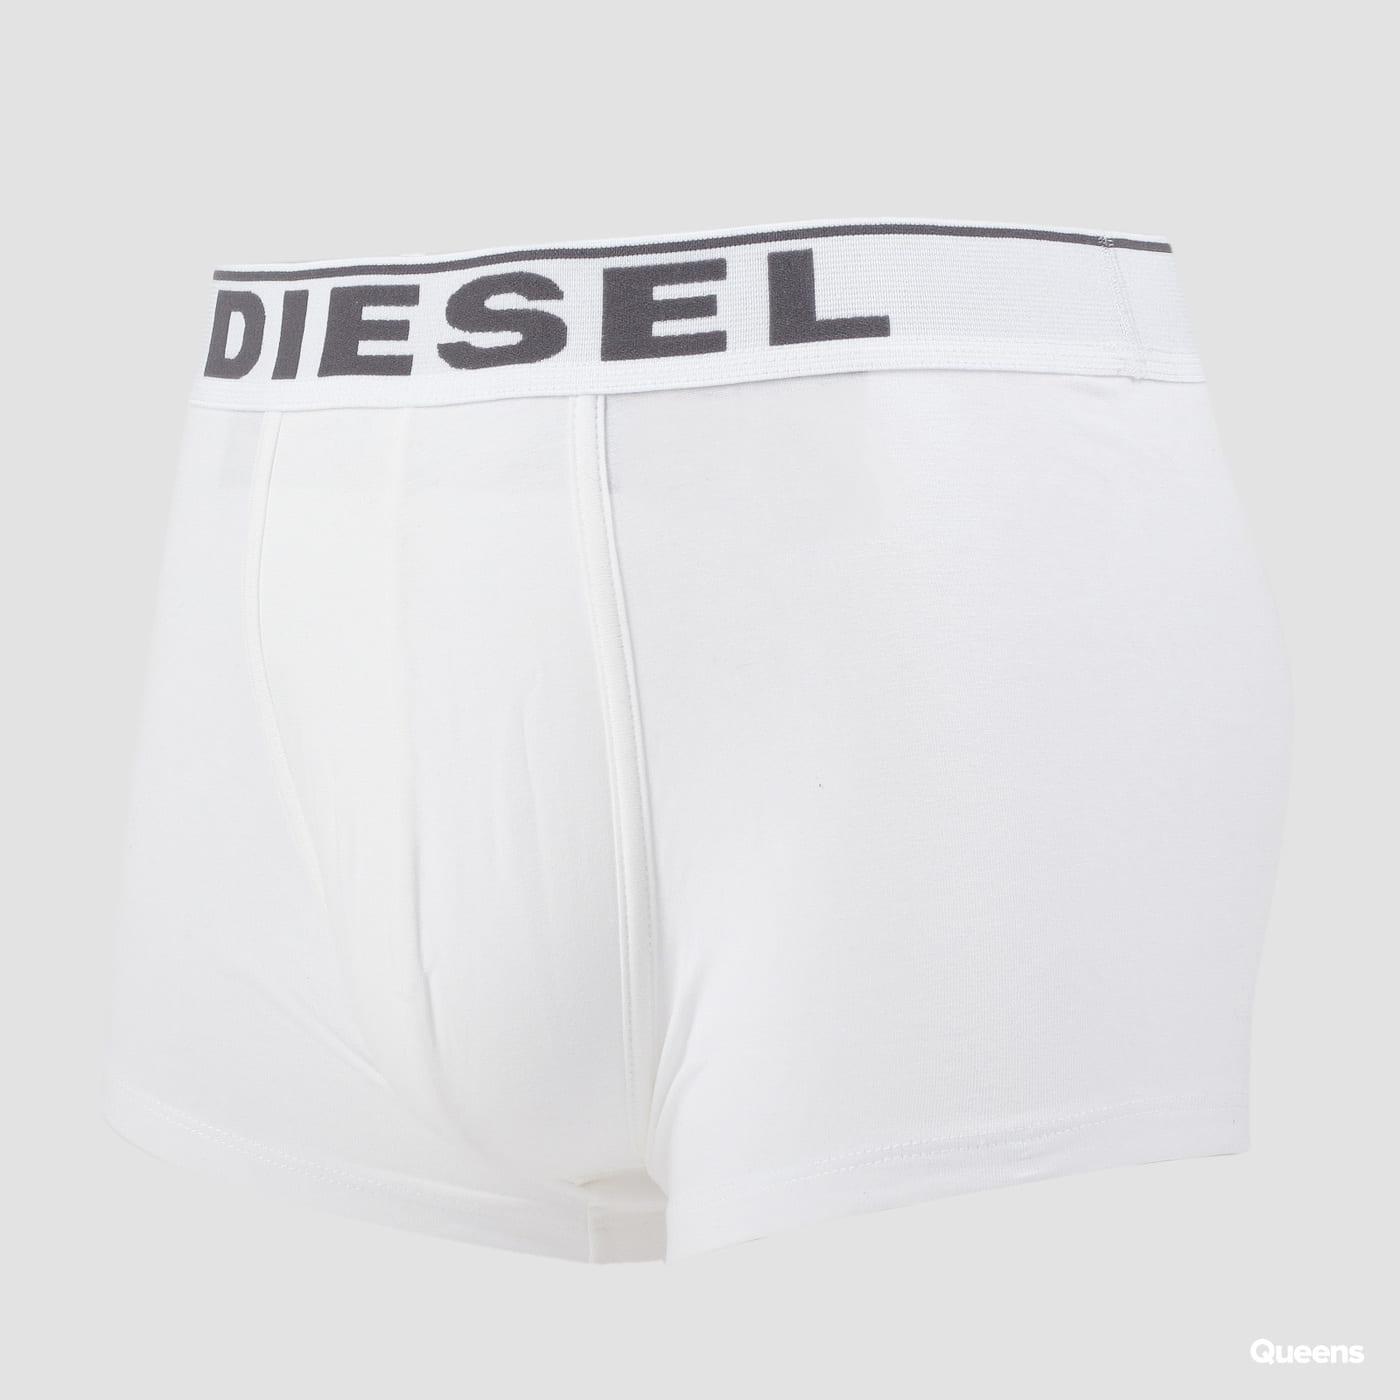 DIESEL 2Pack All-Timers Trunks C/O čierne / biele